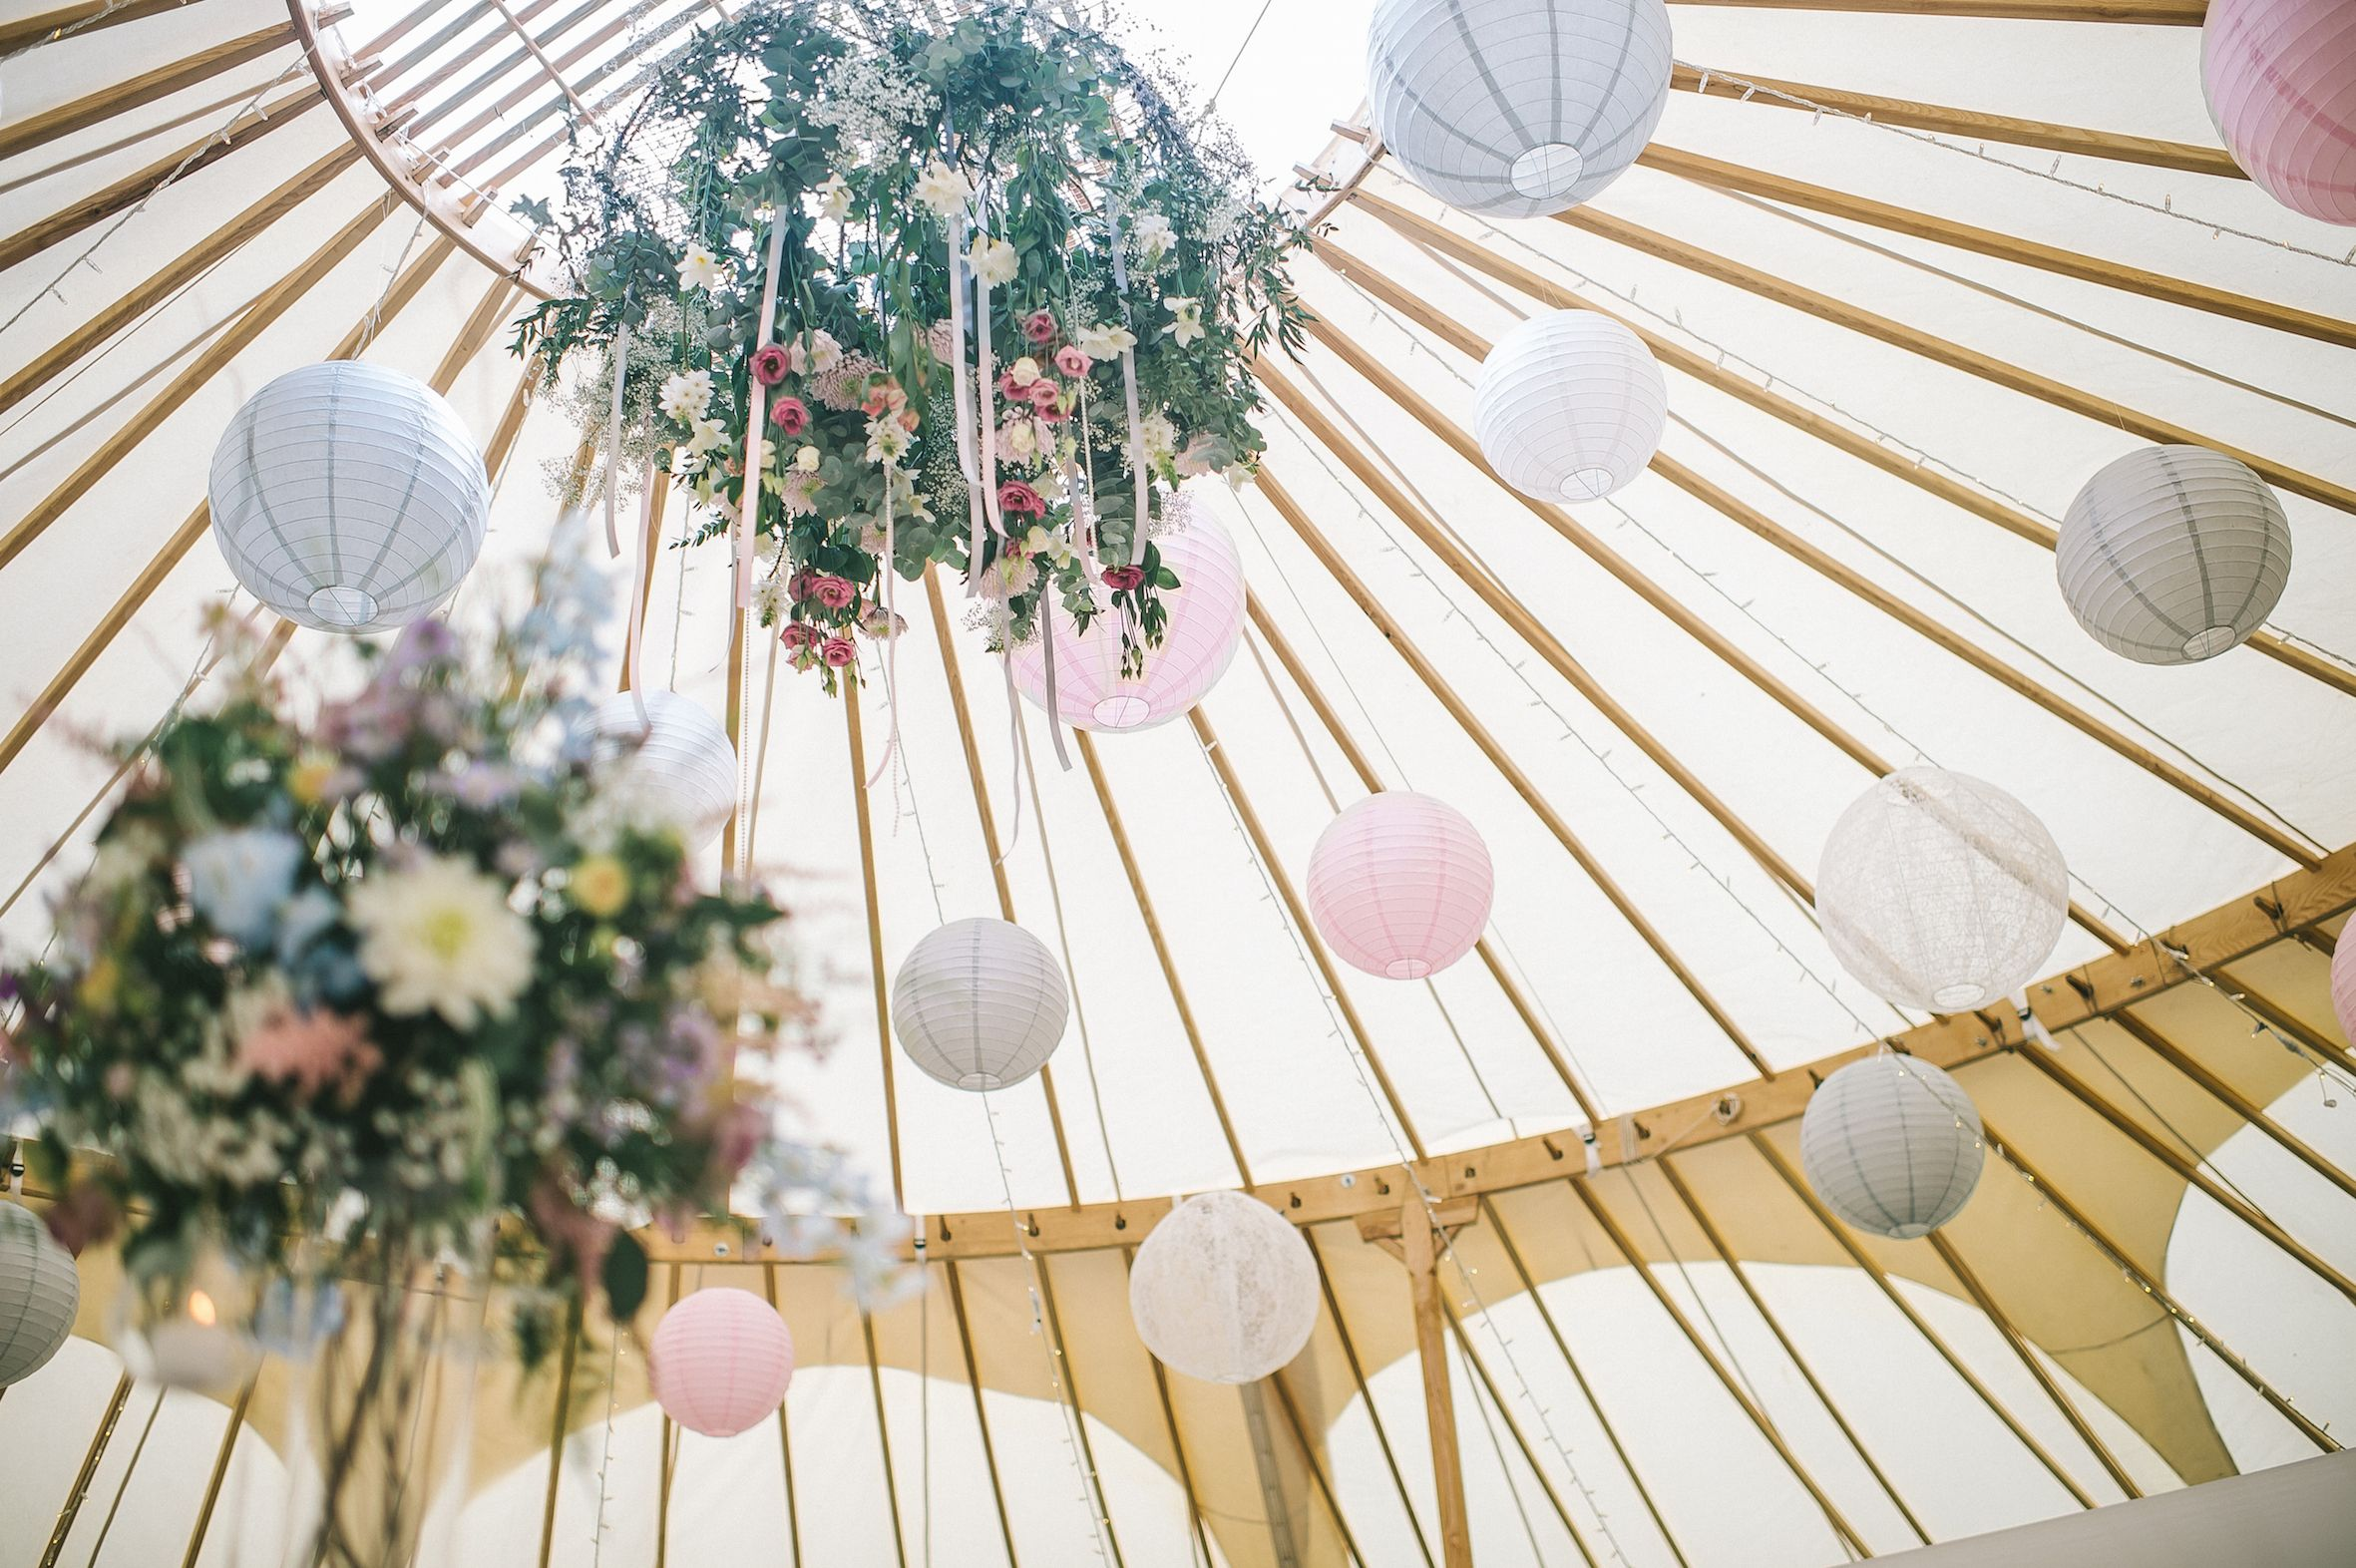 50ft yurt - Yorkshire Yurts